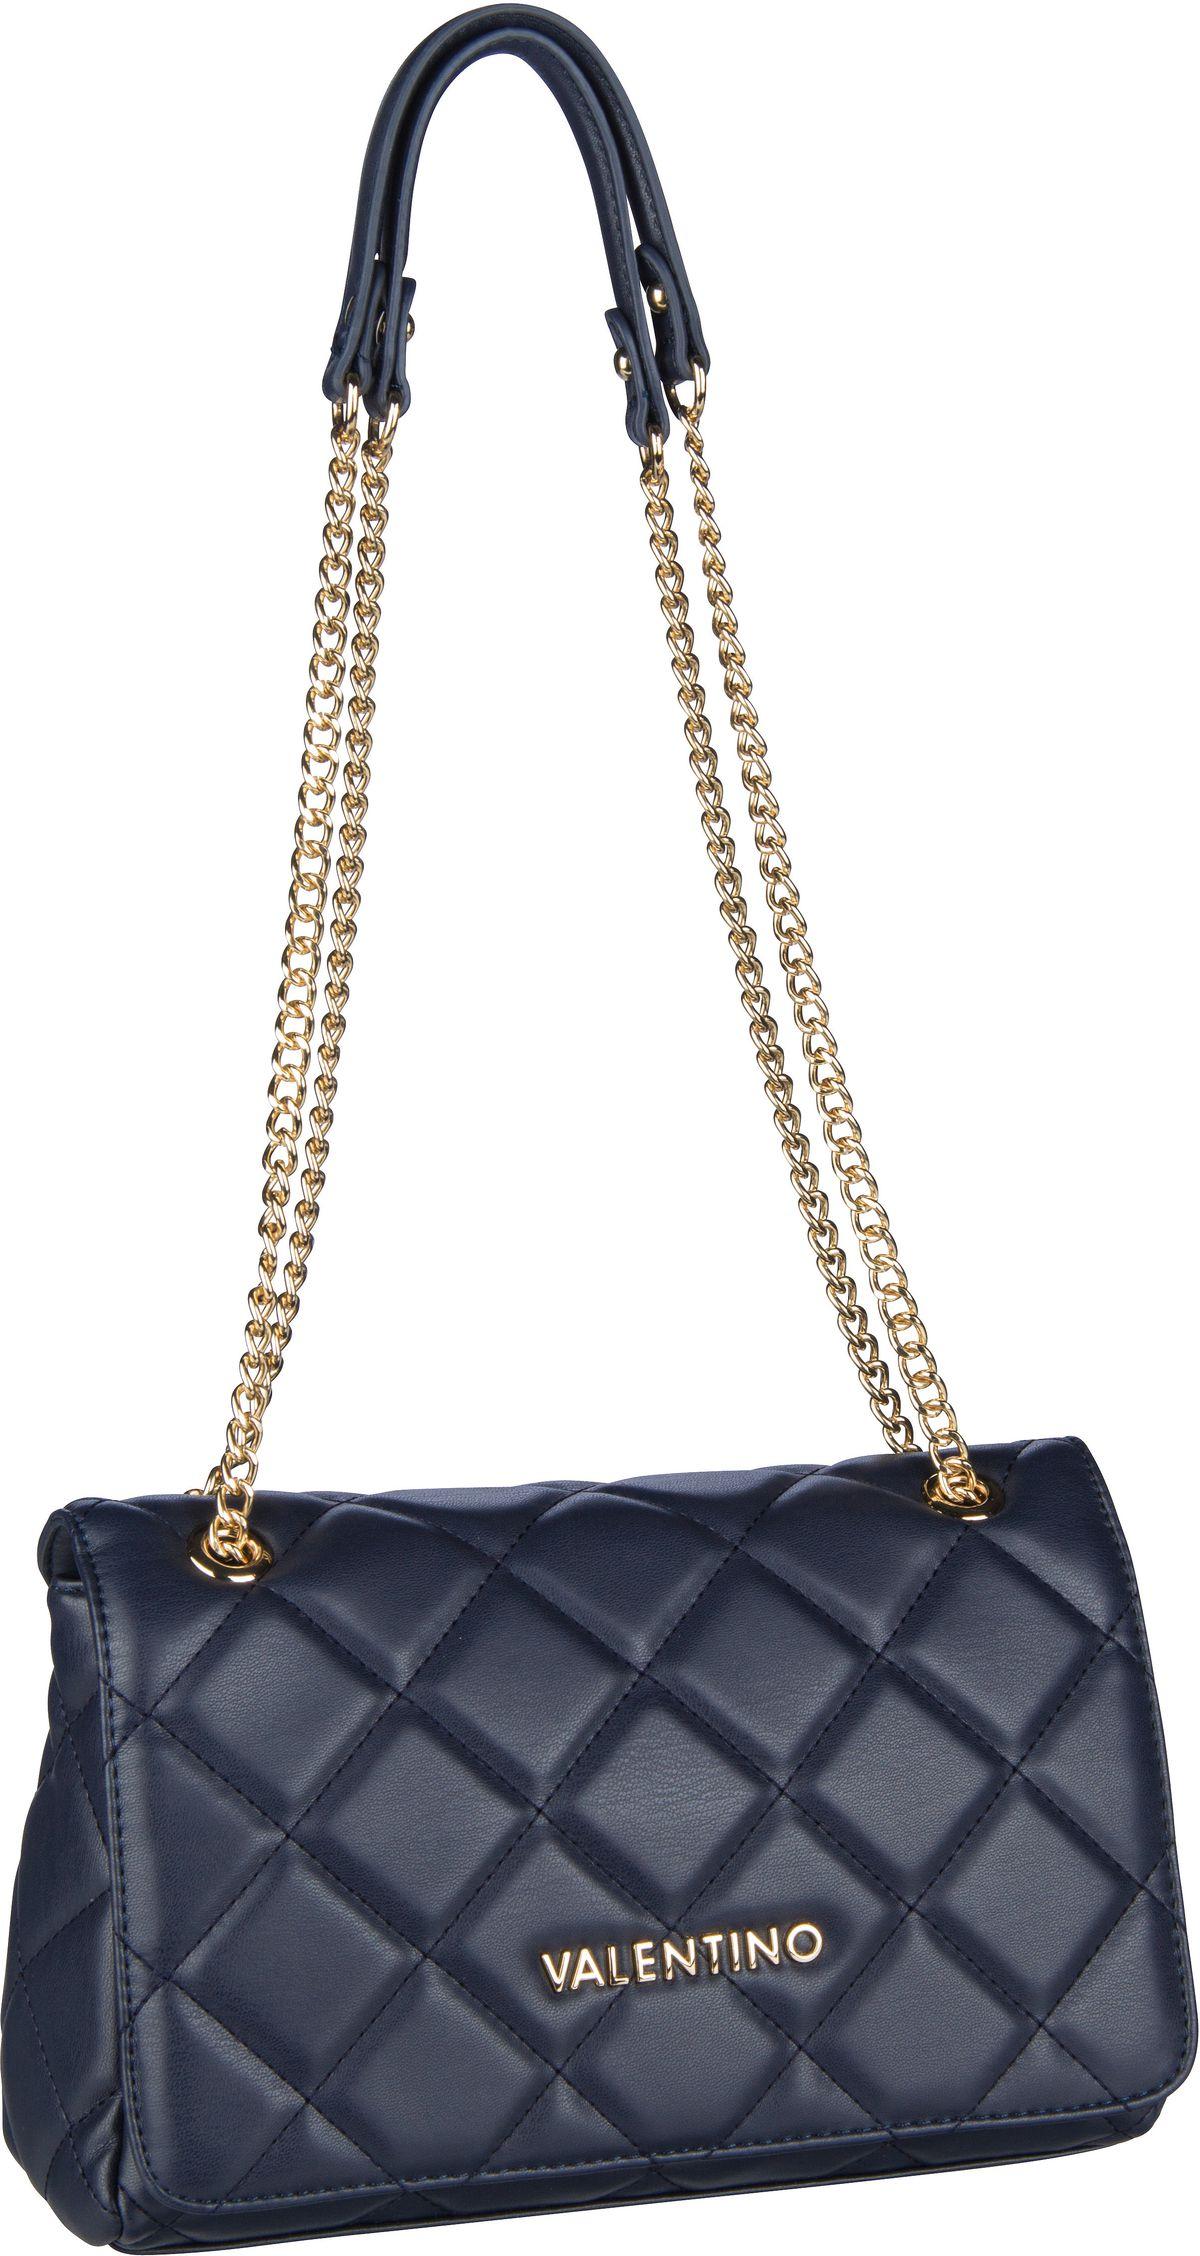 Bags Handtasche Ocarina Pattina K02 Blu